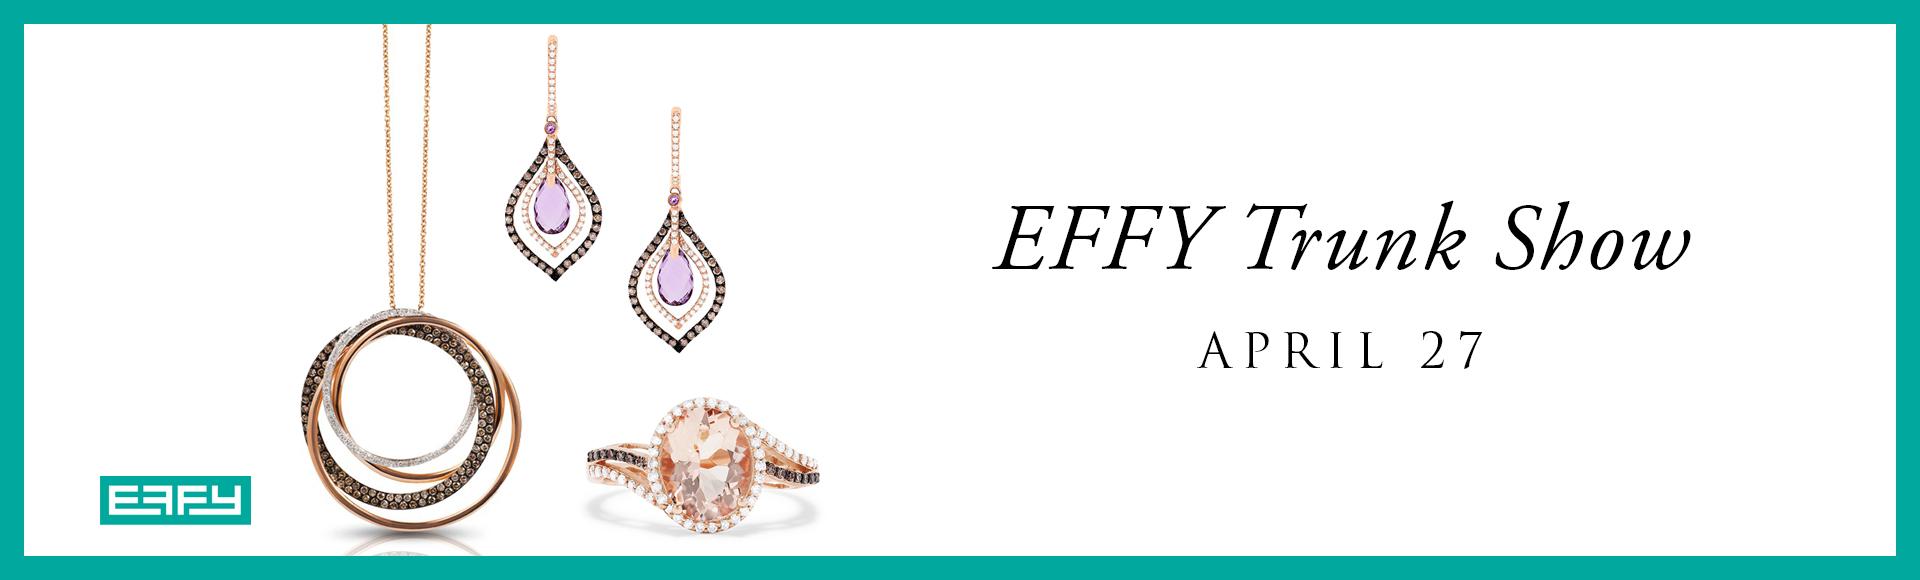 Effy Trunk Show April 27